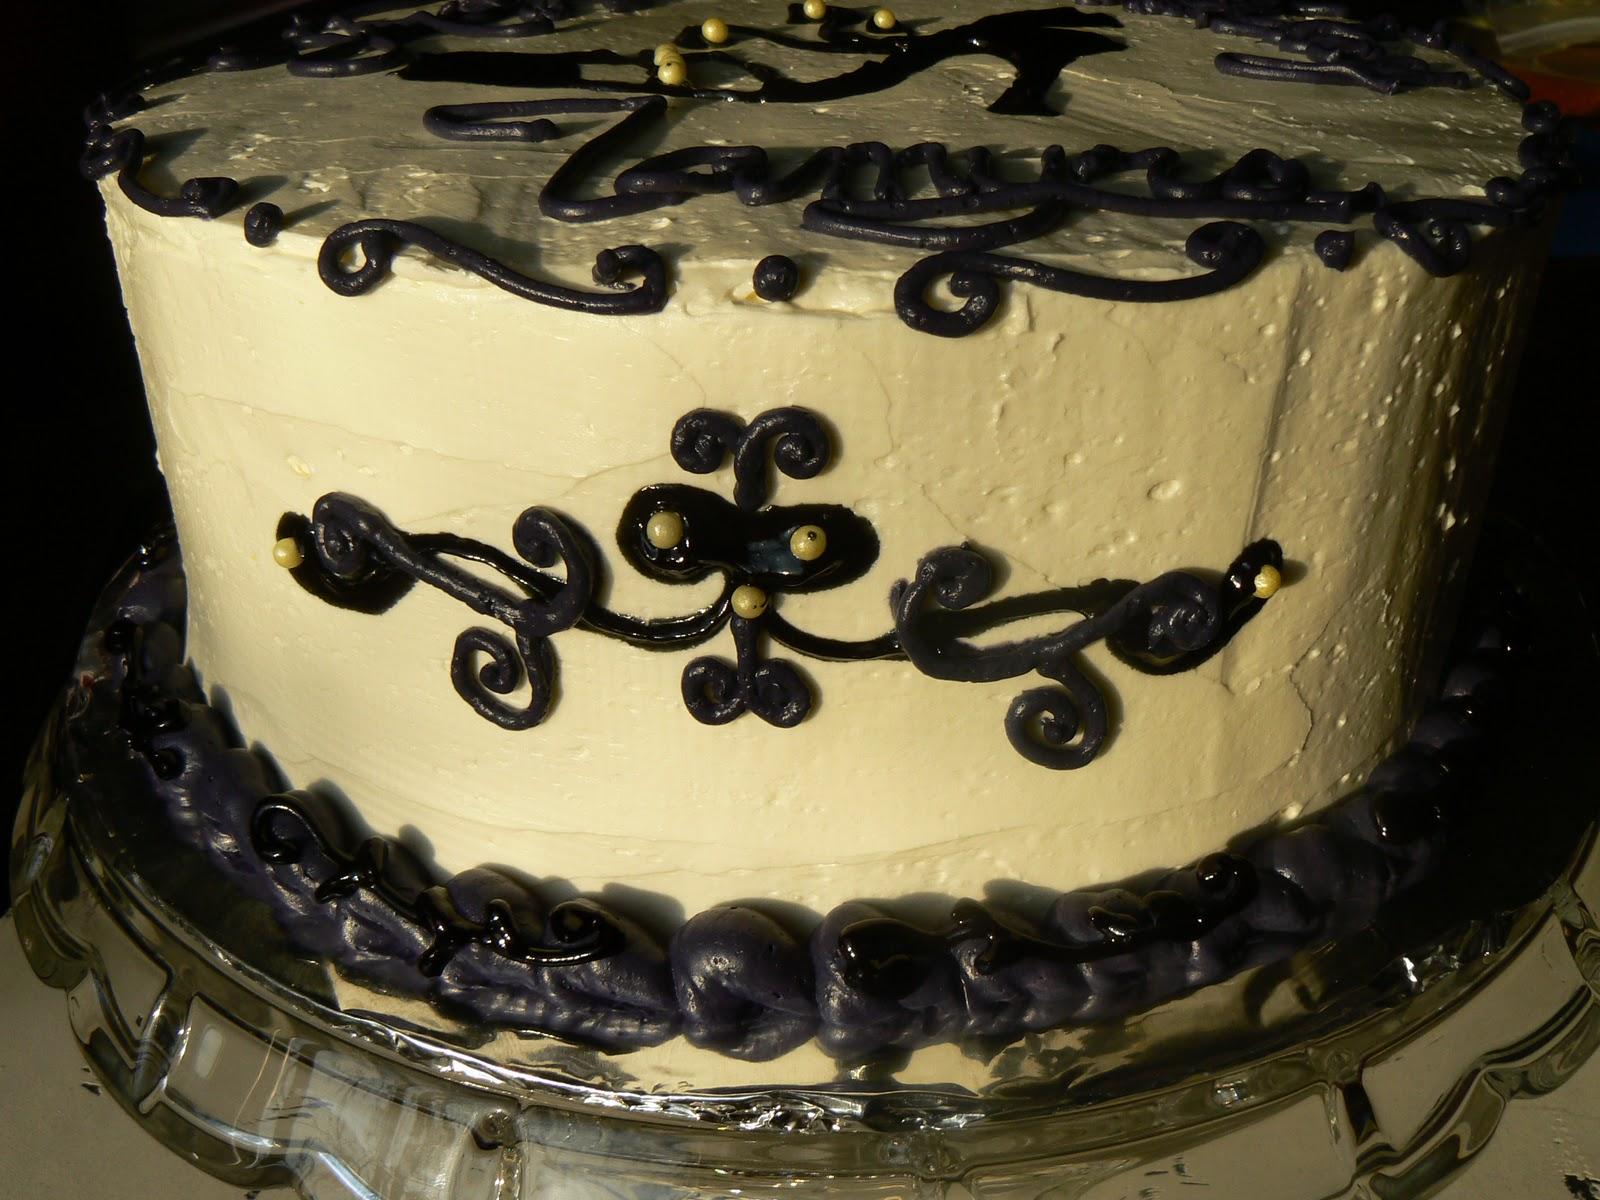 Bake Lore: Cake Gallery